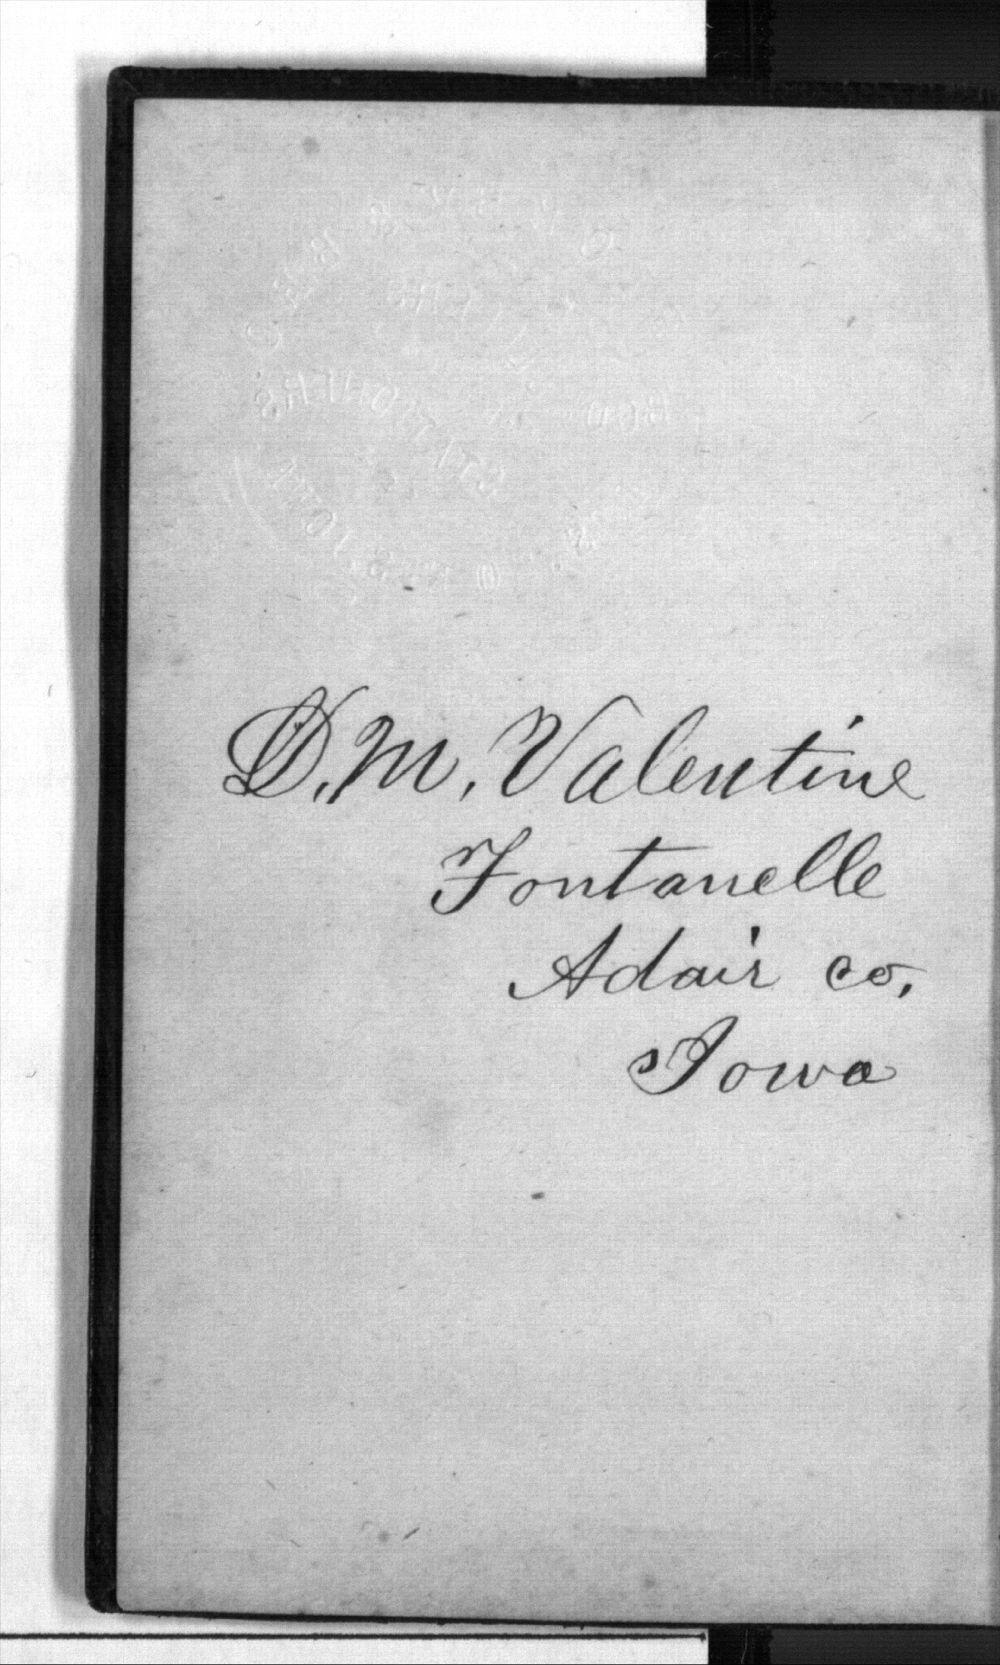 Daniel Mulford Valentine's diary - Signature